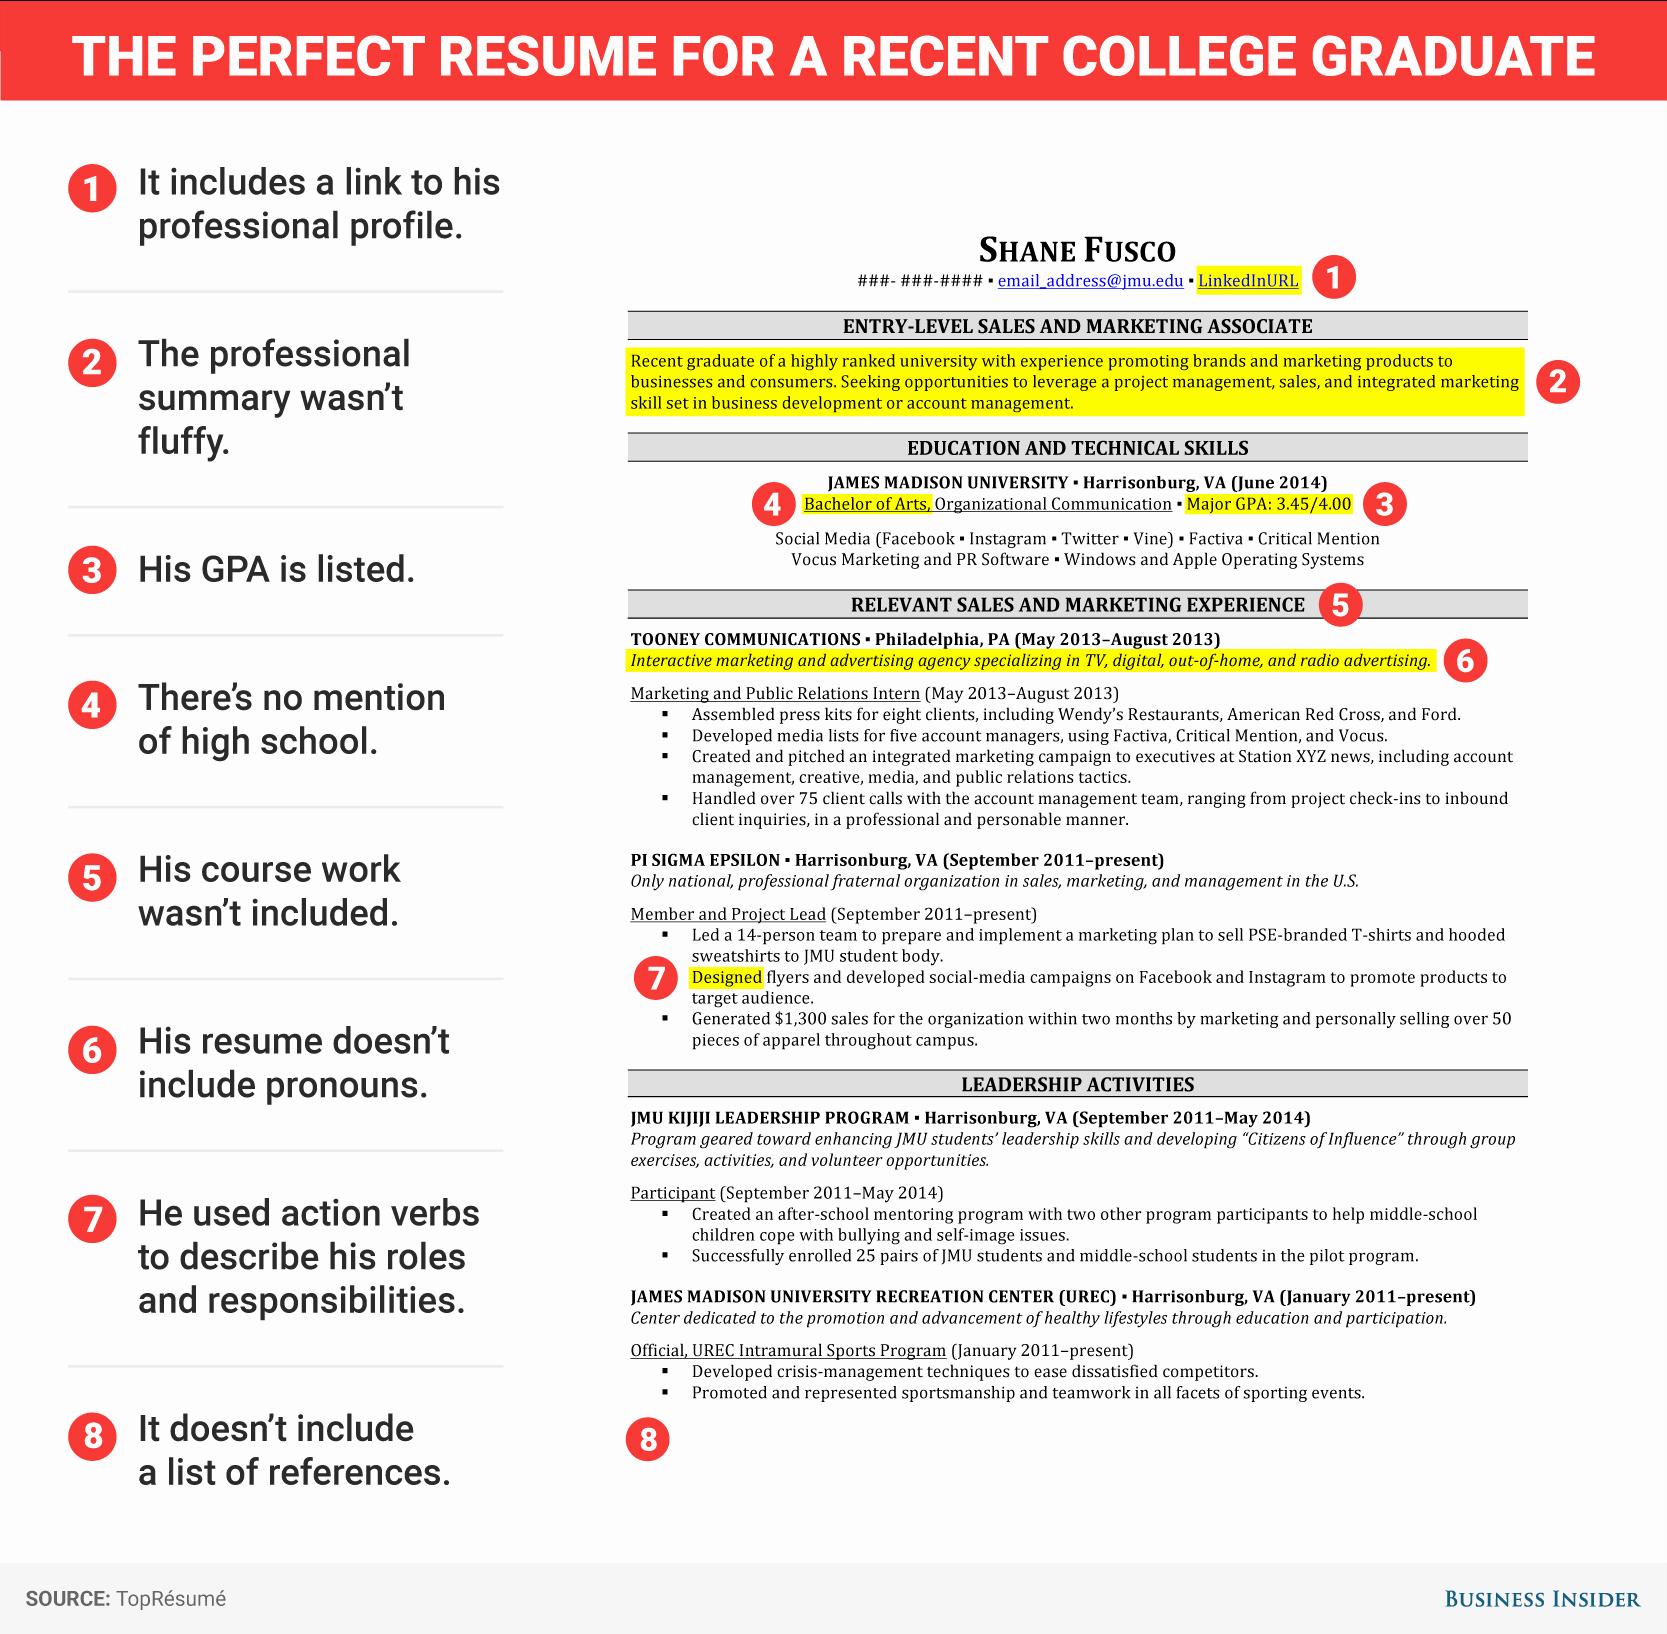 Resumes for Recent College Graduates Inspirational Excellent Resume for Recent College Grad Business Insider